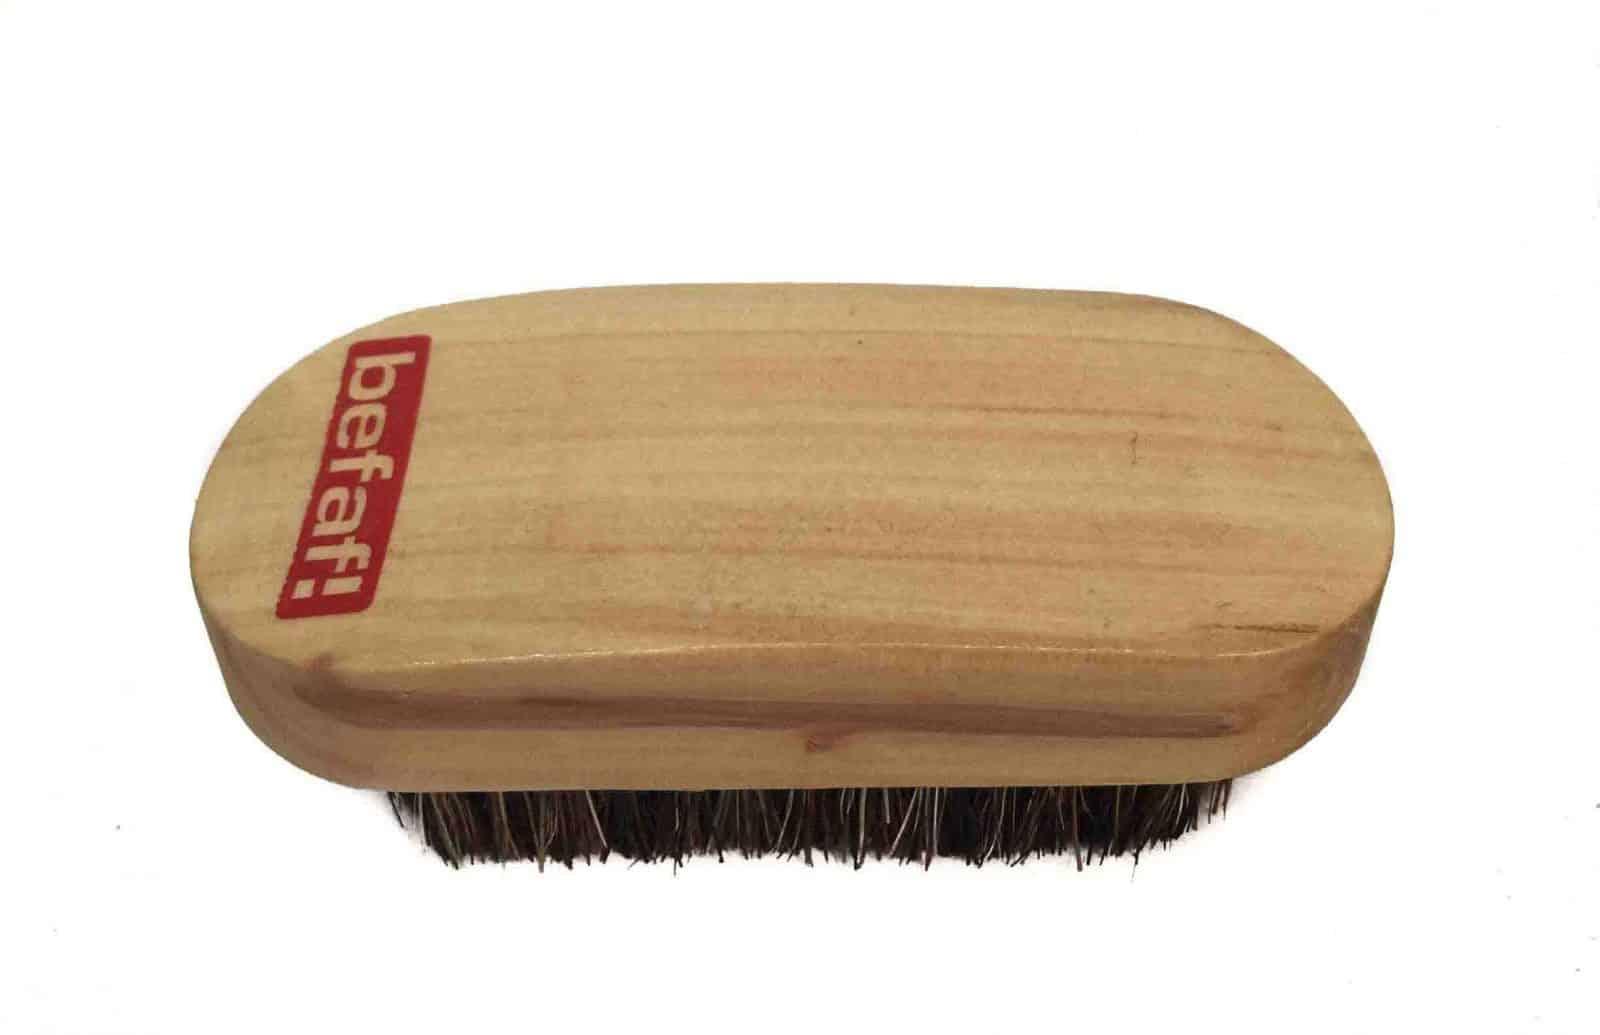 befaf beard brush and comb3 befaf men 39 s hair beard grooming. Black Bedroom Furniture Sets. Home Design Ideas